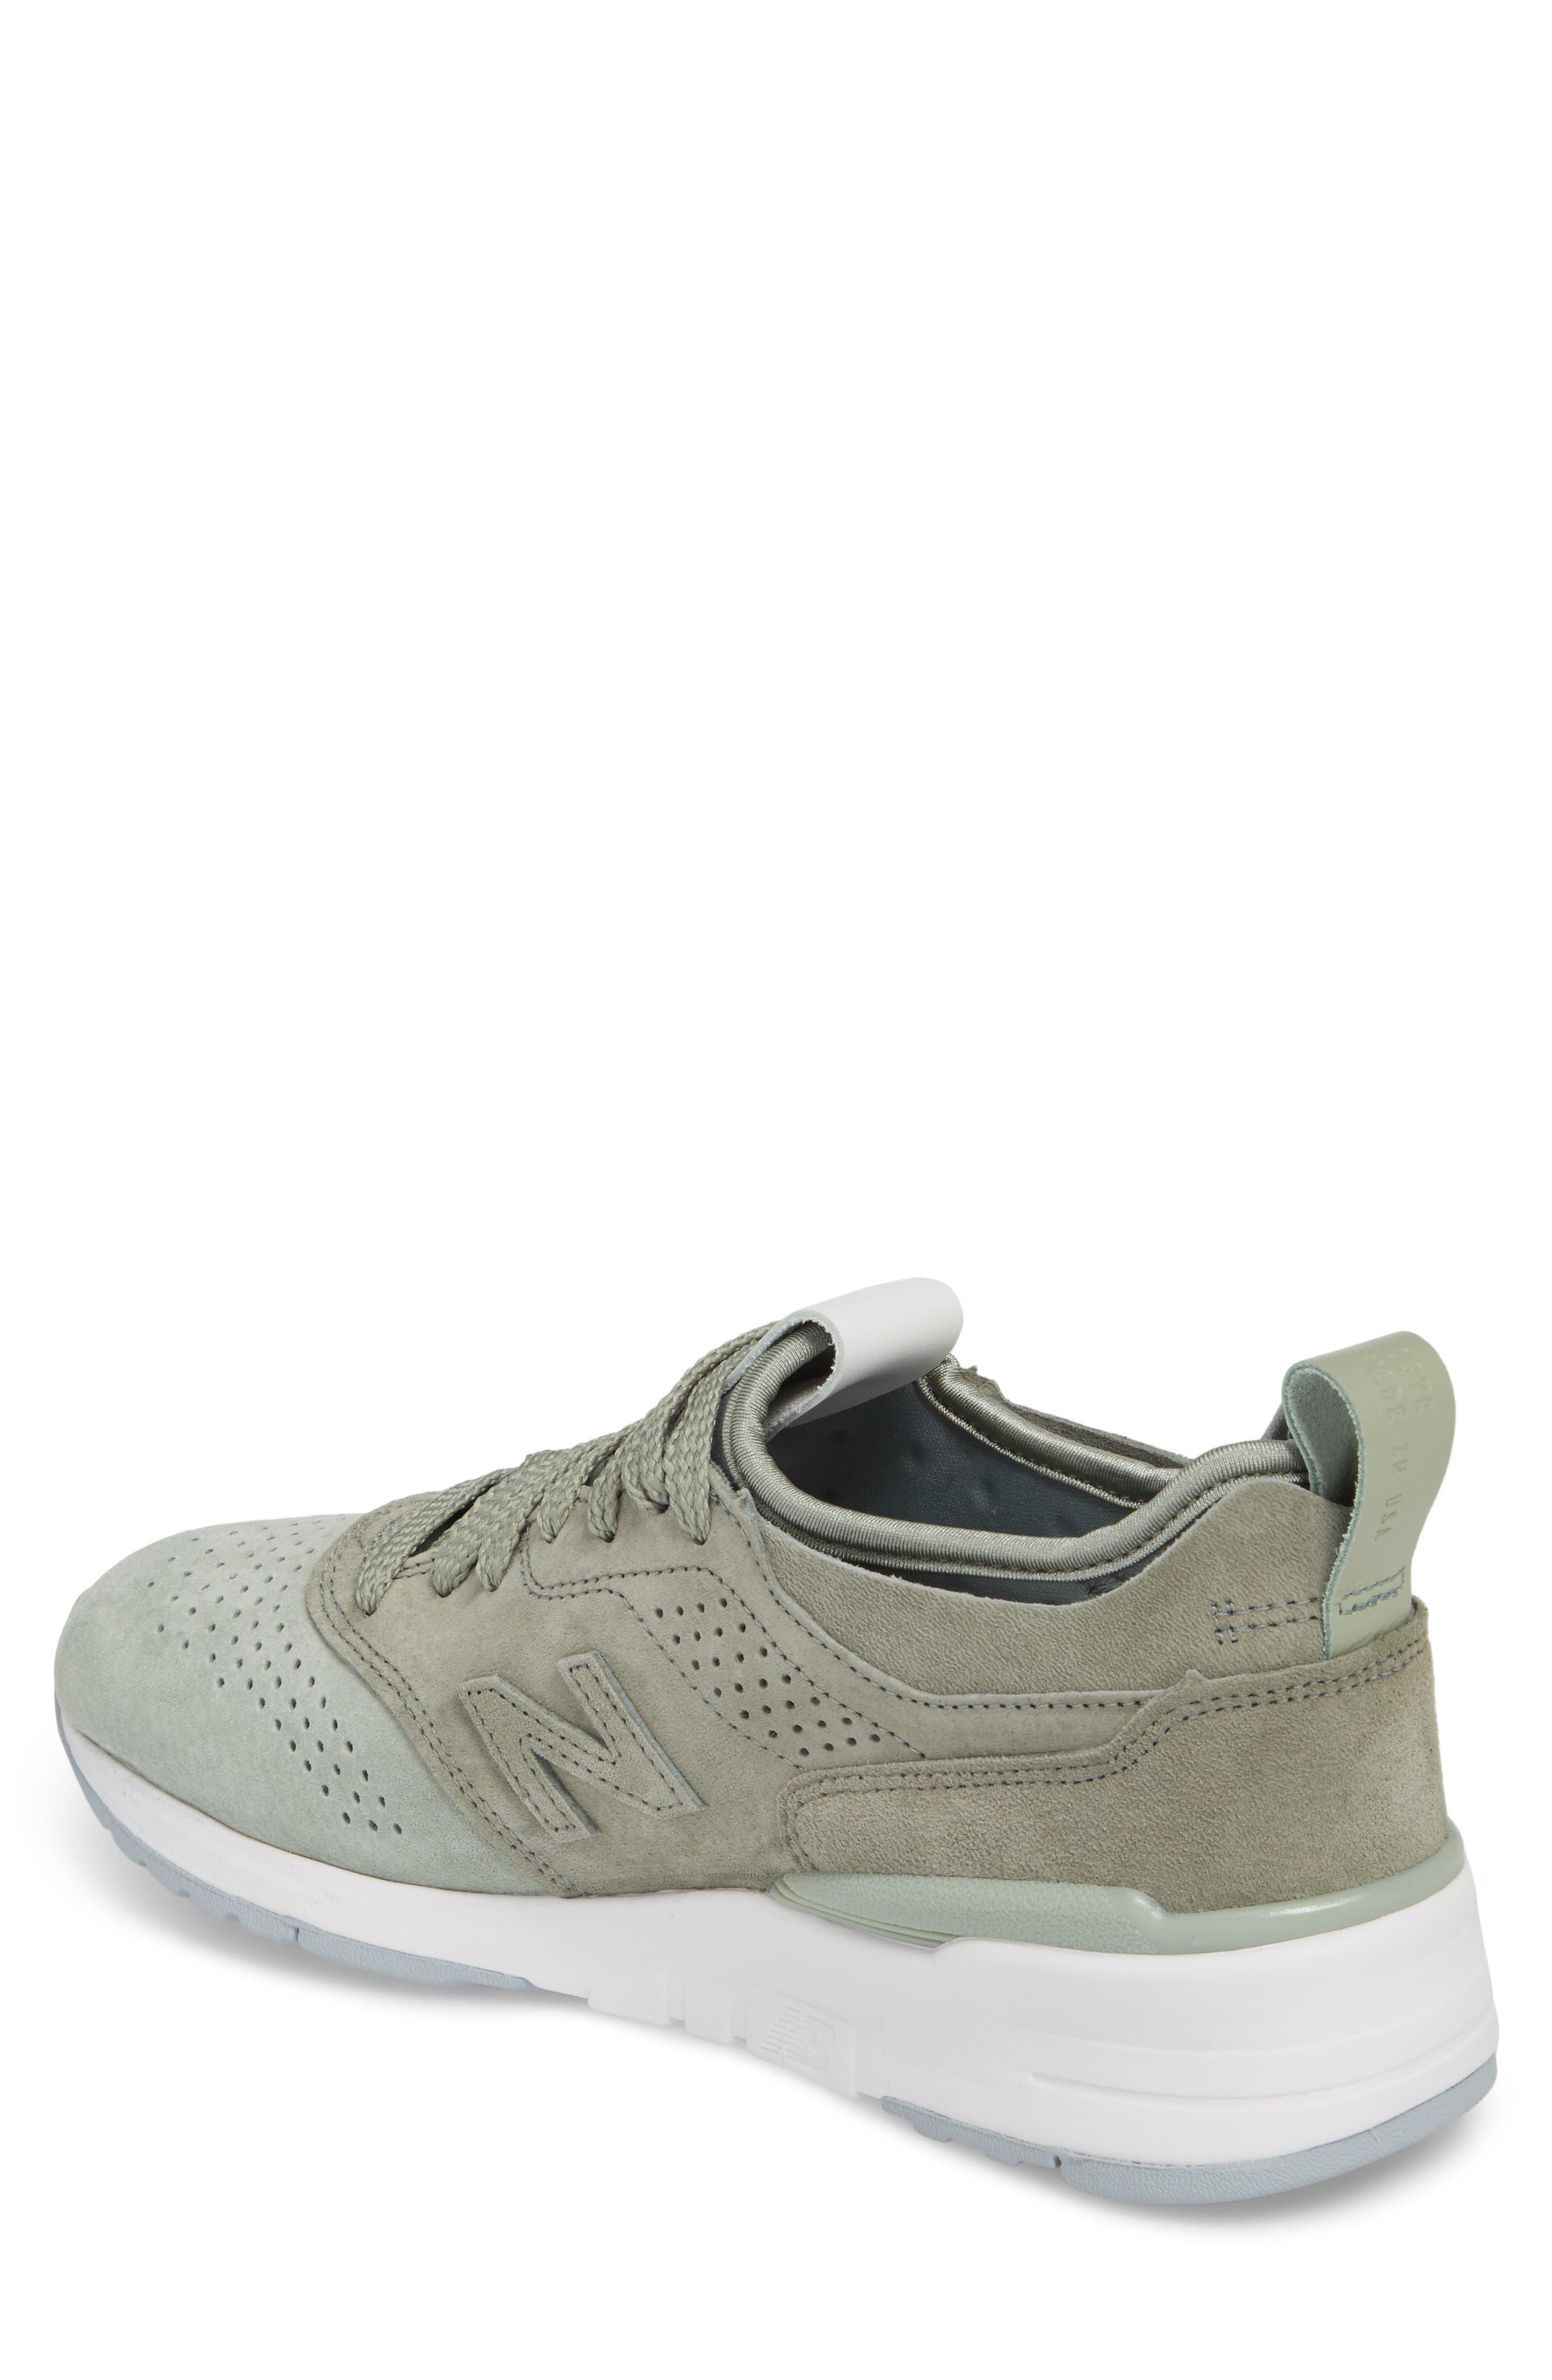 Alternate Image 2  - New Balance 997R Perforated Sneaker (Men)